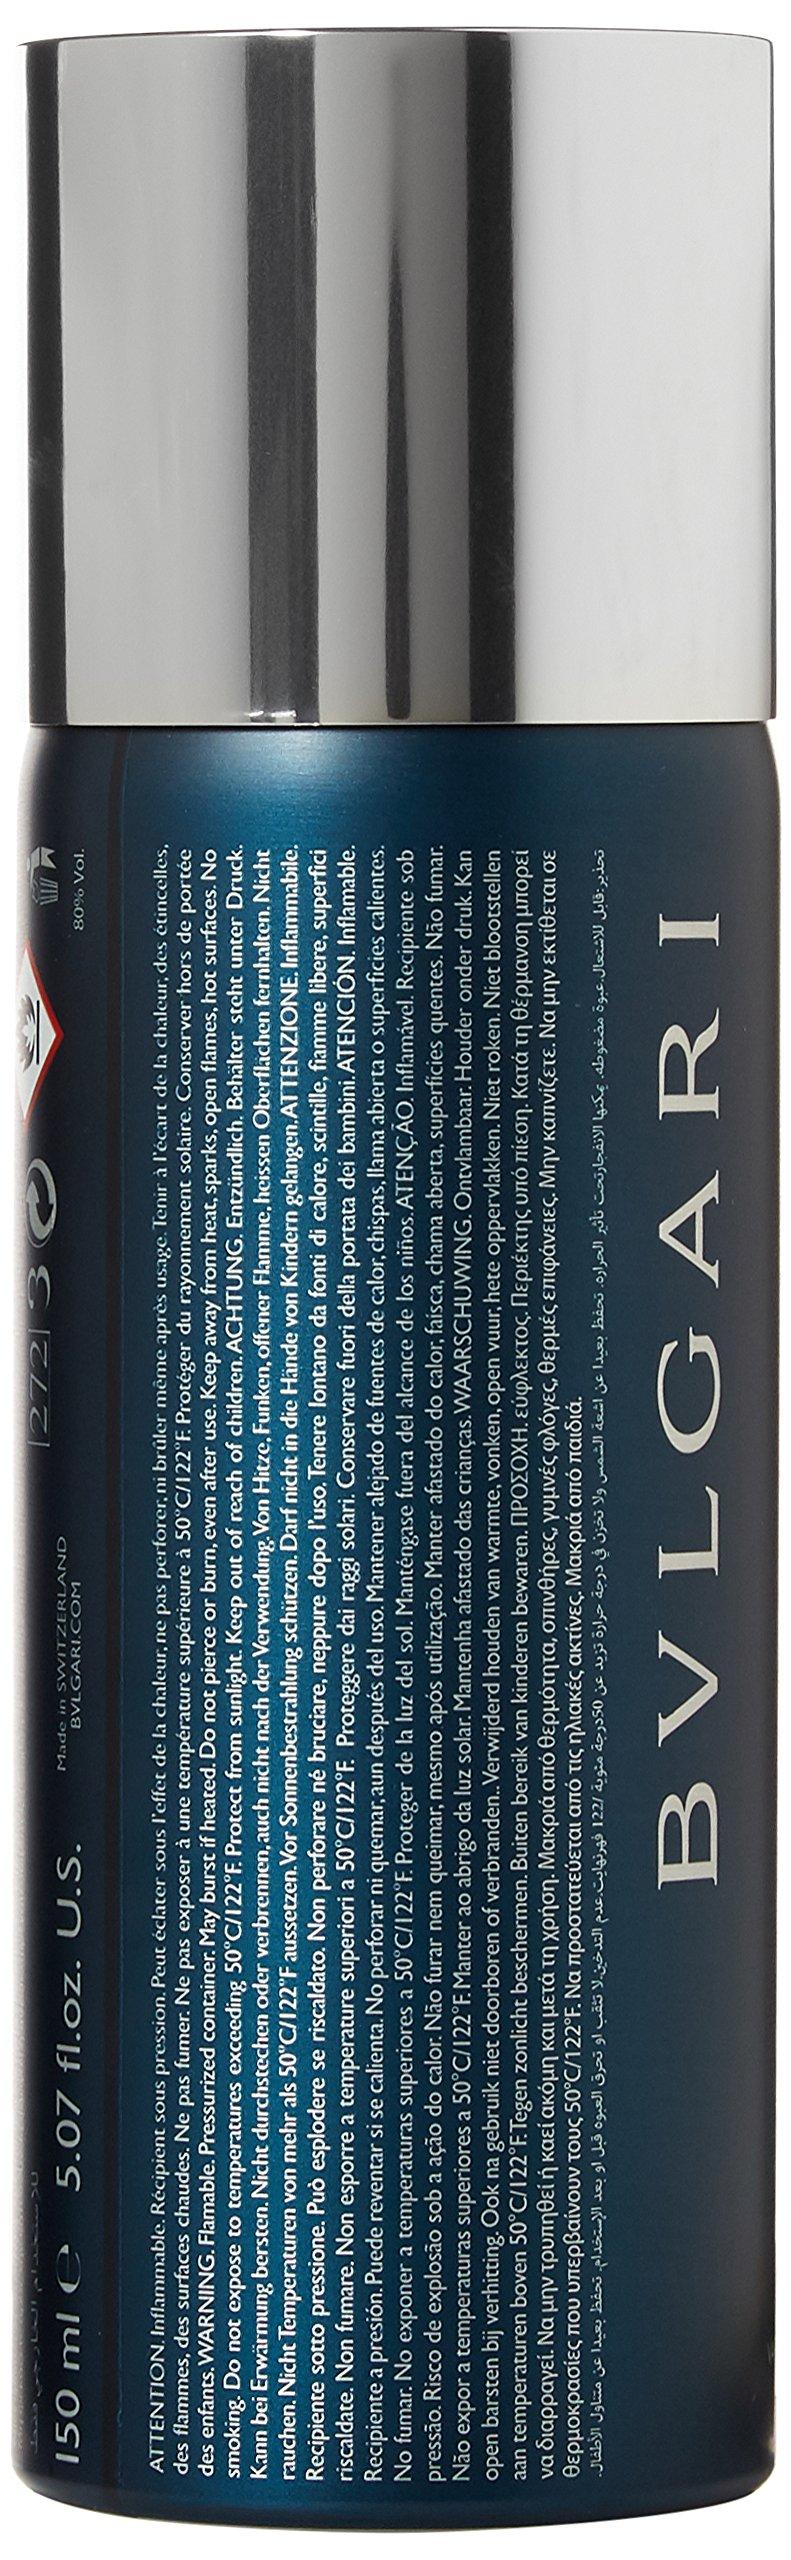 Bvlgari Refreshing Body Spray for Men, Aqva, 5.07 Ounce by BVLGARI (Image #4)